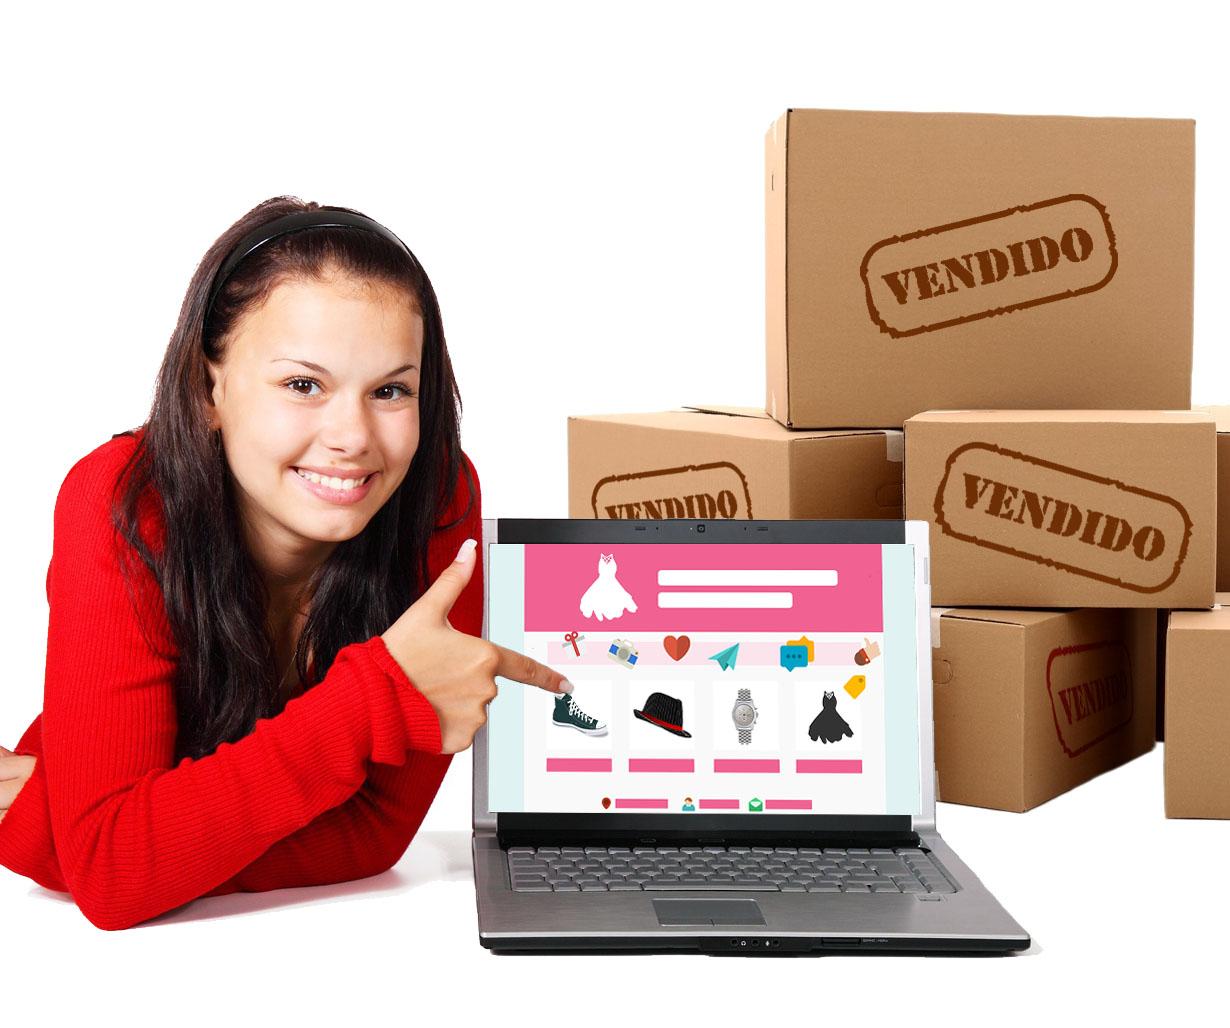 charla montar tienda online